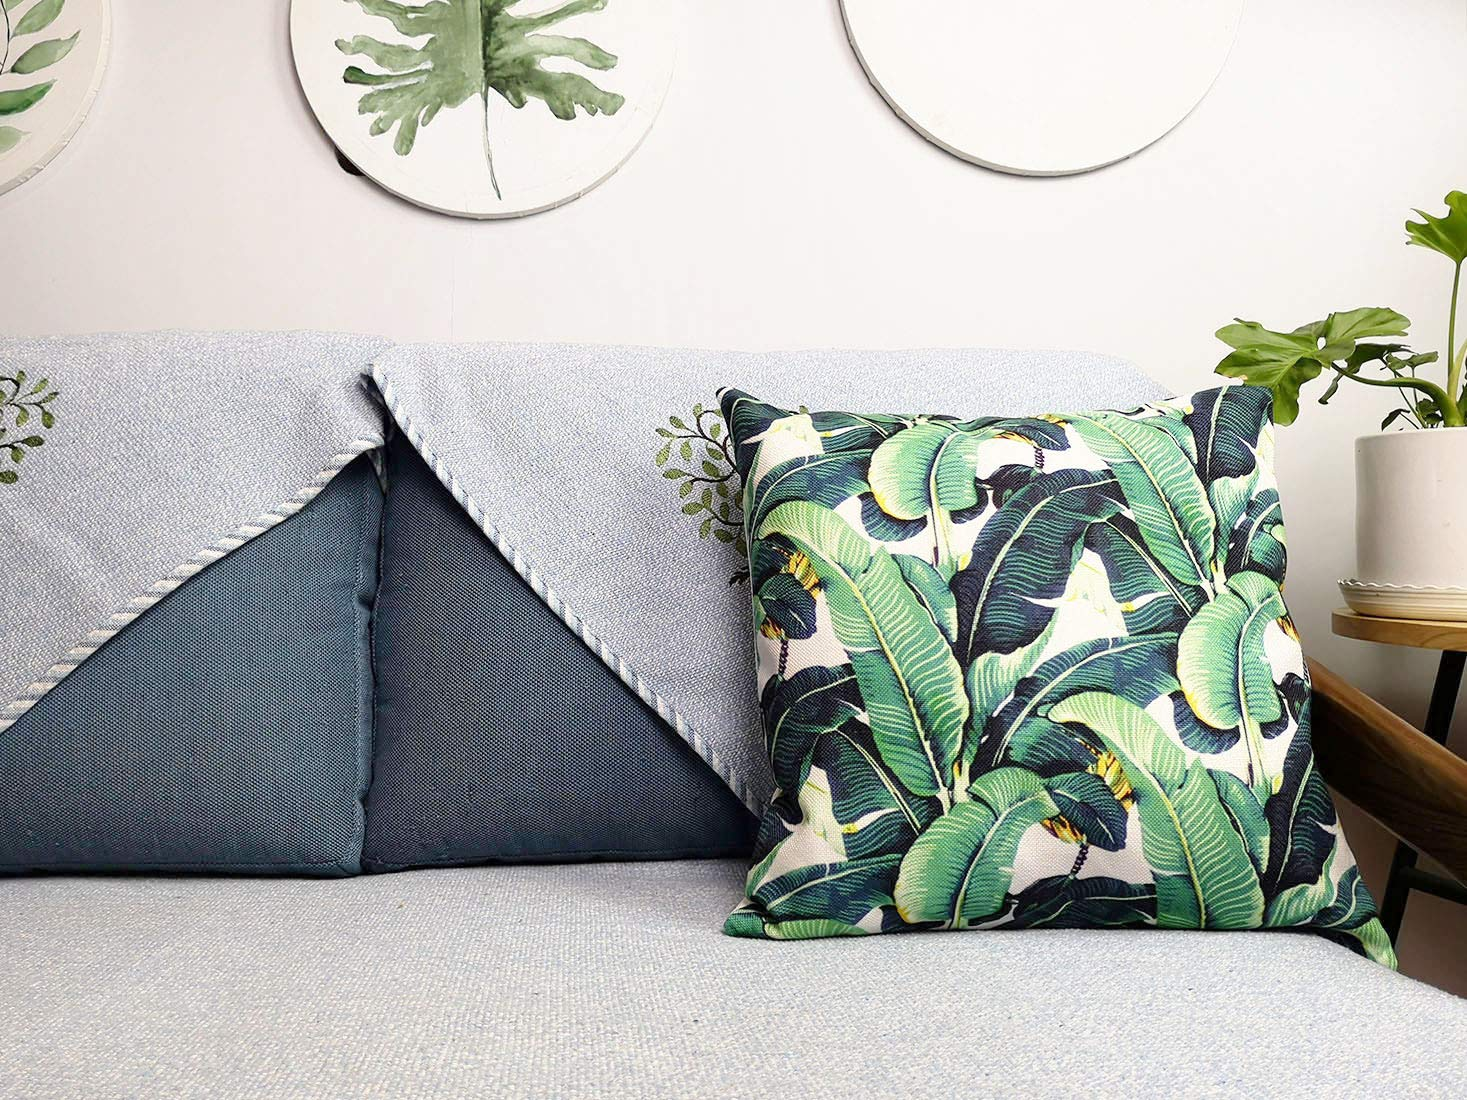 Turnip Design Tropical Plant Leaf Home Decor Wedding Housewarming Gift Cotton Cushion Cover Throw Pillow Case TDPN37